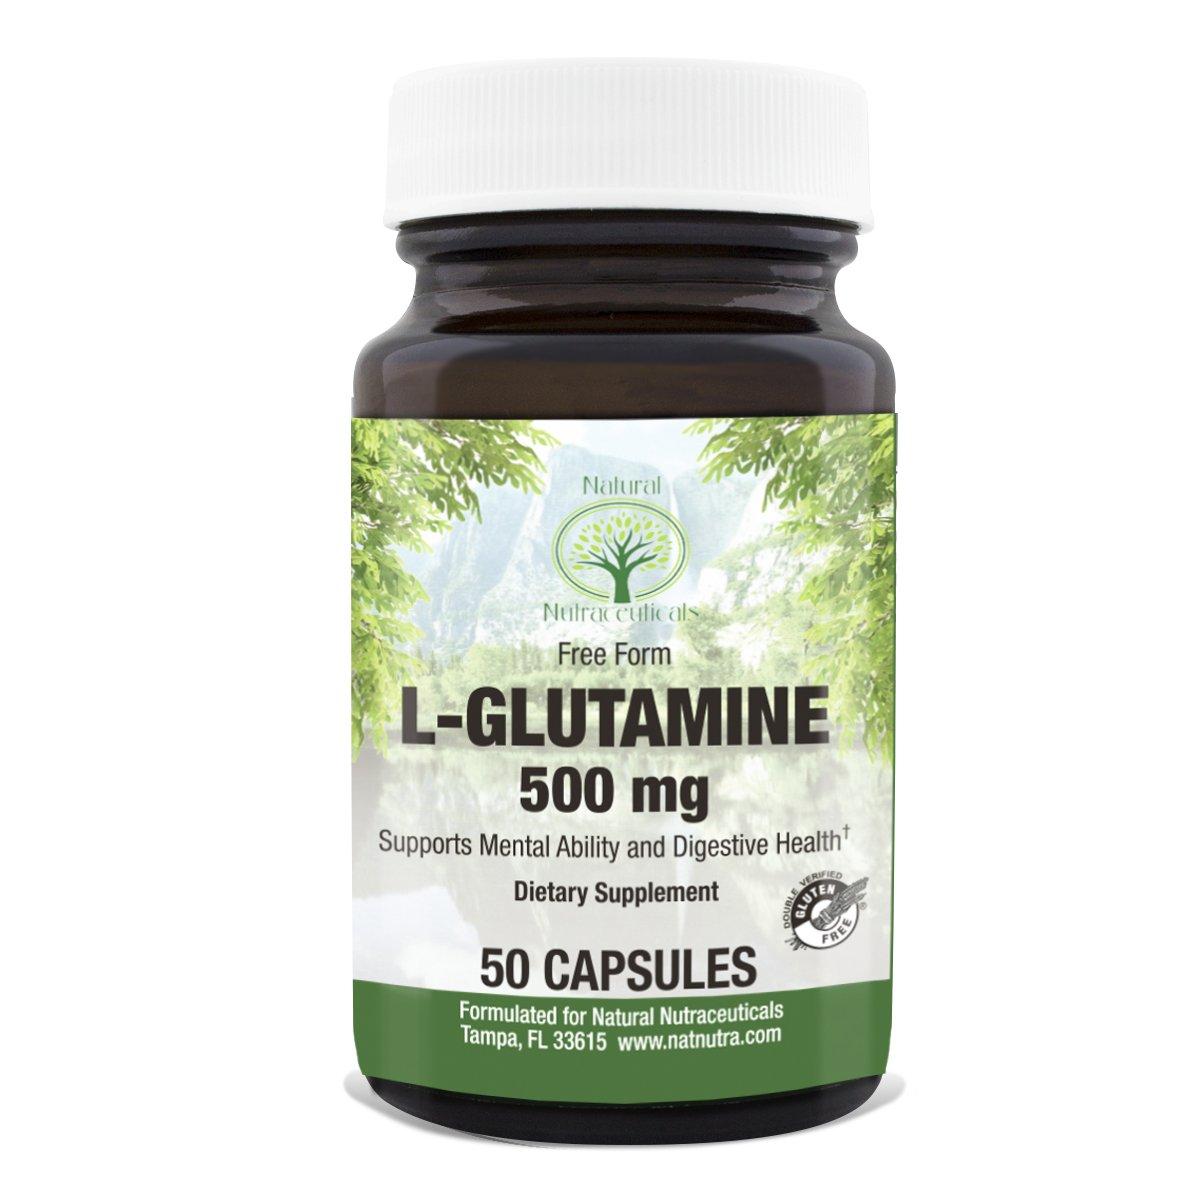 Natural Nutra L-Glutamine, 50 Capsules, 500 mg